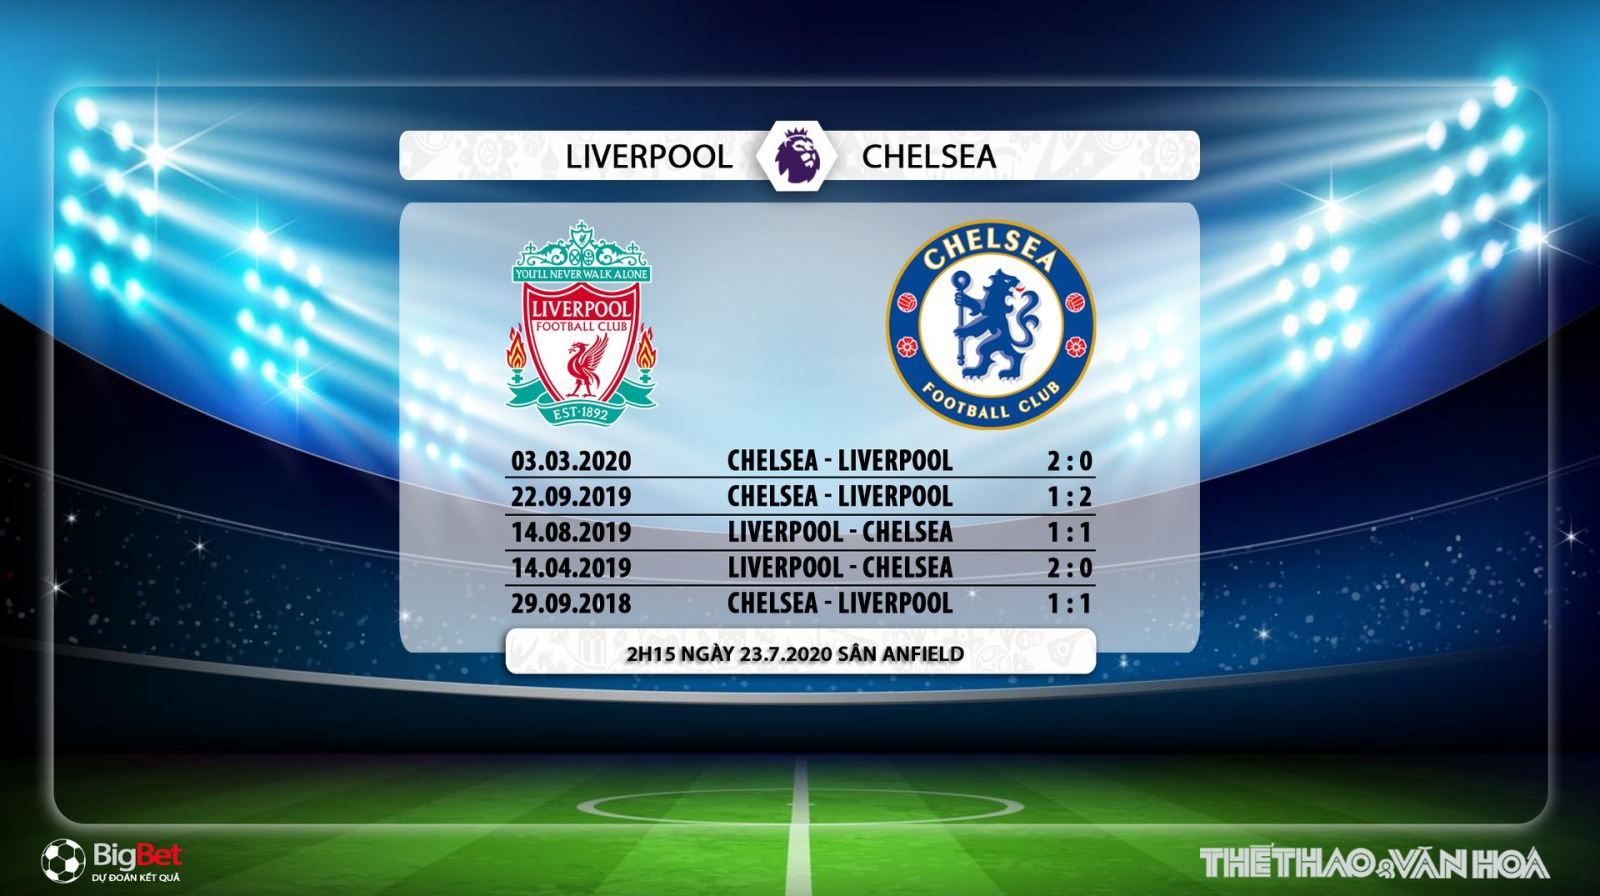 Liverpool vs Chelsea, soi kèo Liverpool vs Chelsea, kèo Liverpool vs Chelsea, liverpool, chelsea, trực tiếp Liverpool vs Chelsea, kèo bóng đá, soi kèo bóng đá